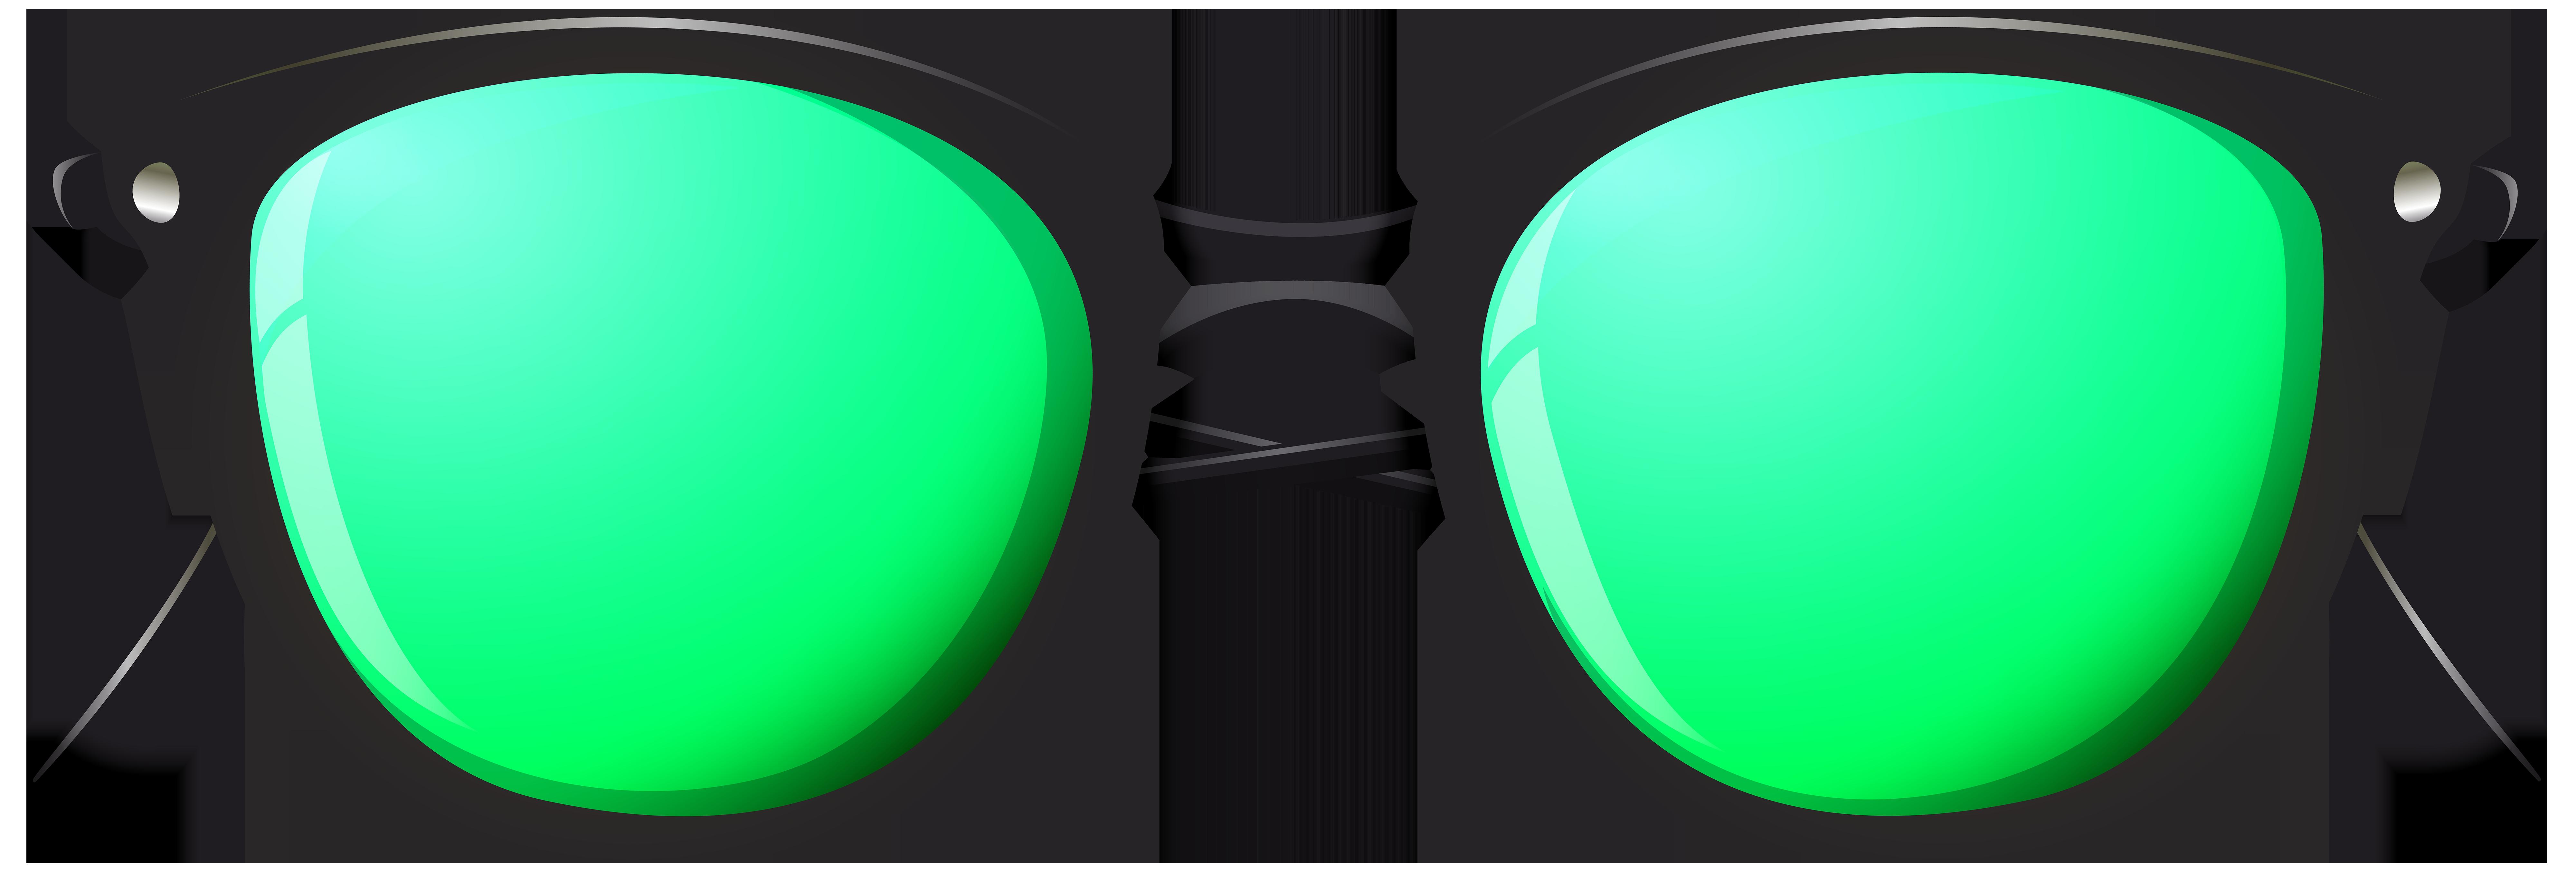 Png clip art image. Sunglasses clipart green